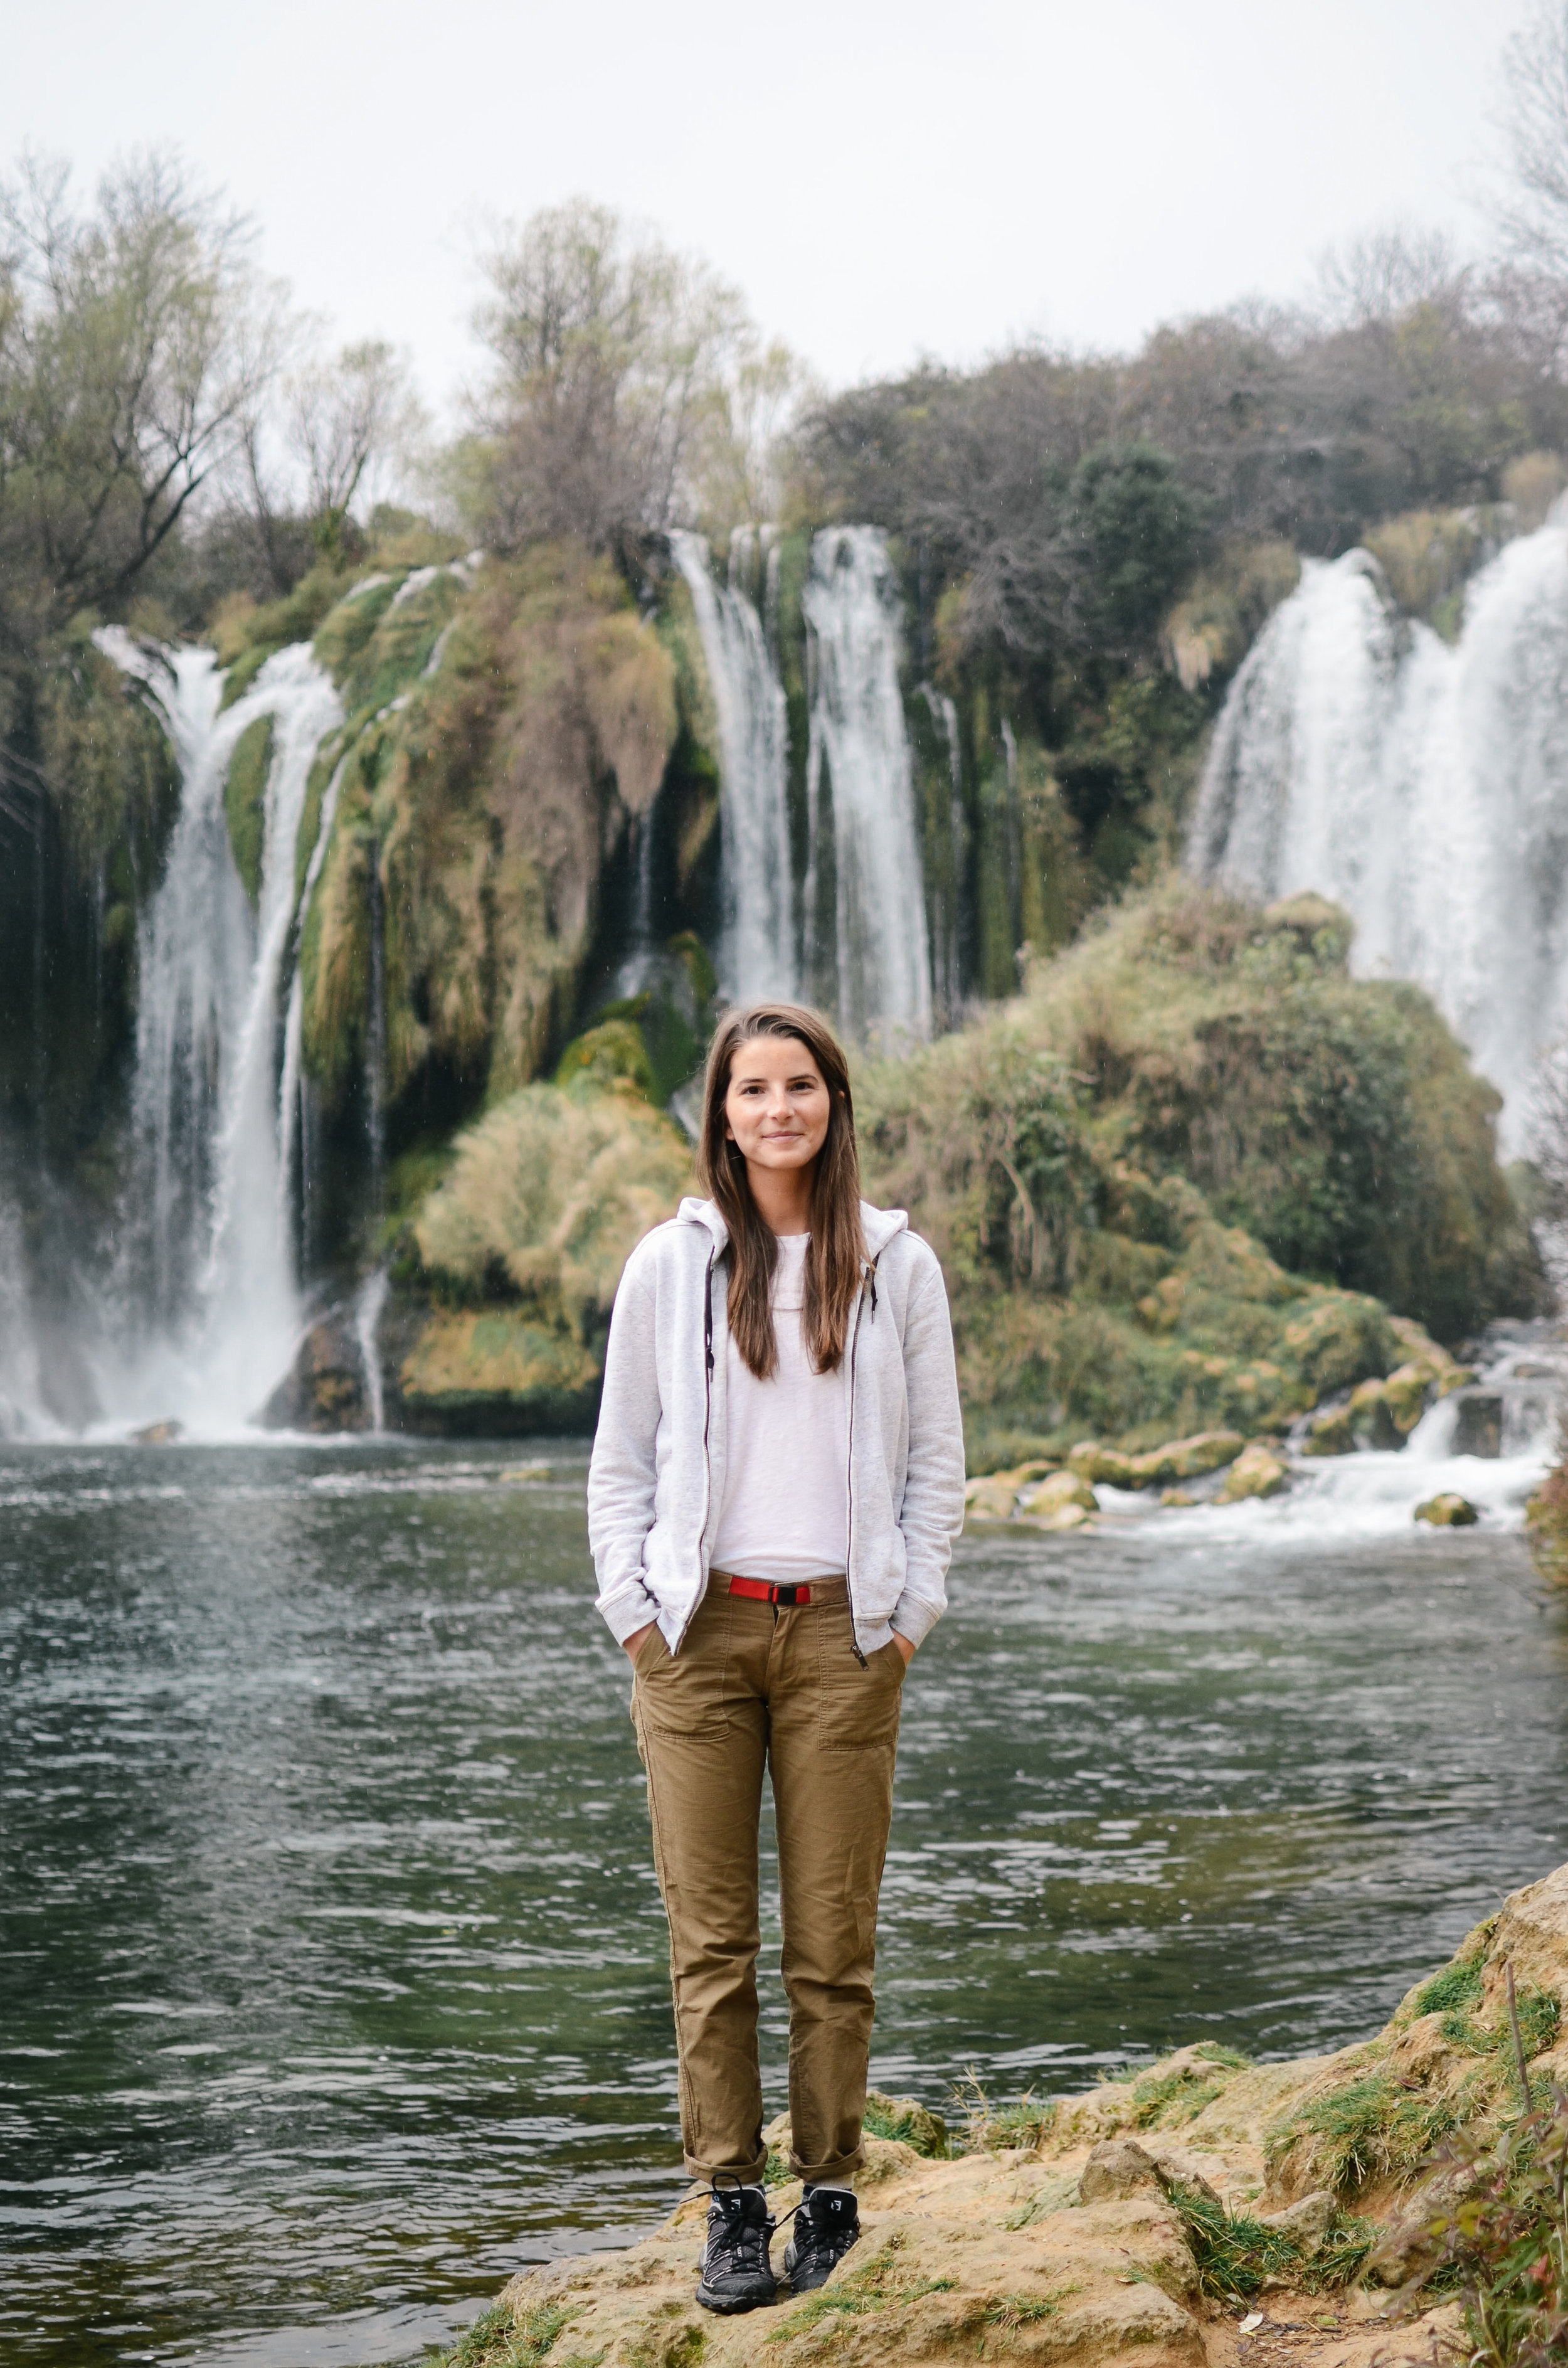 mostar-bosnia-travel-guide-lifeonpine_DSC_3288.jpg